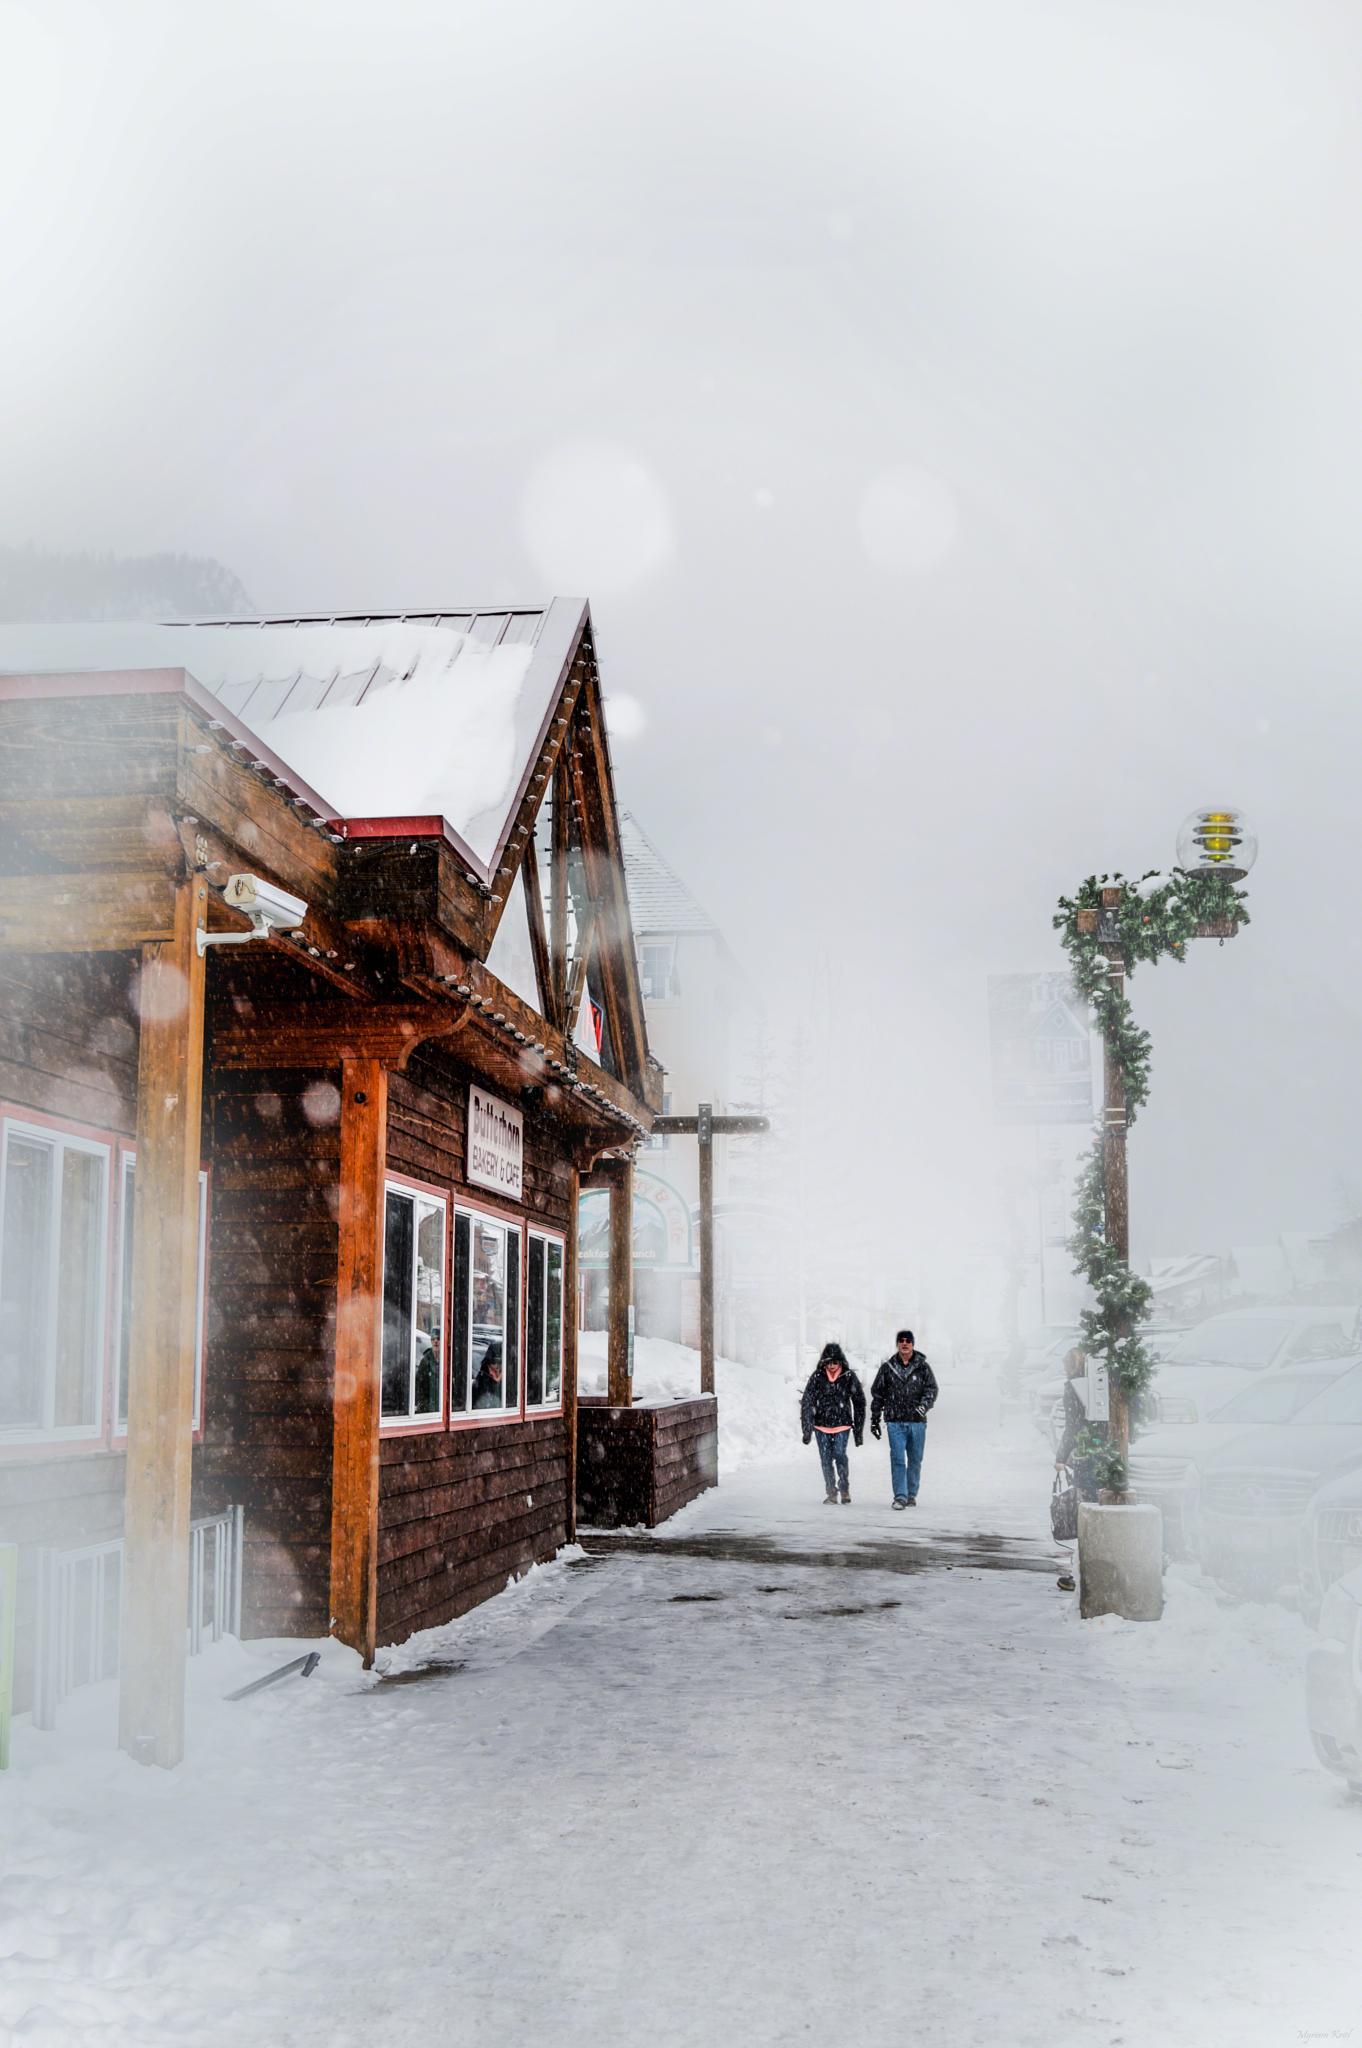 Falling snow by Through my lens